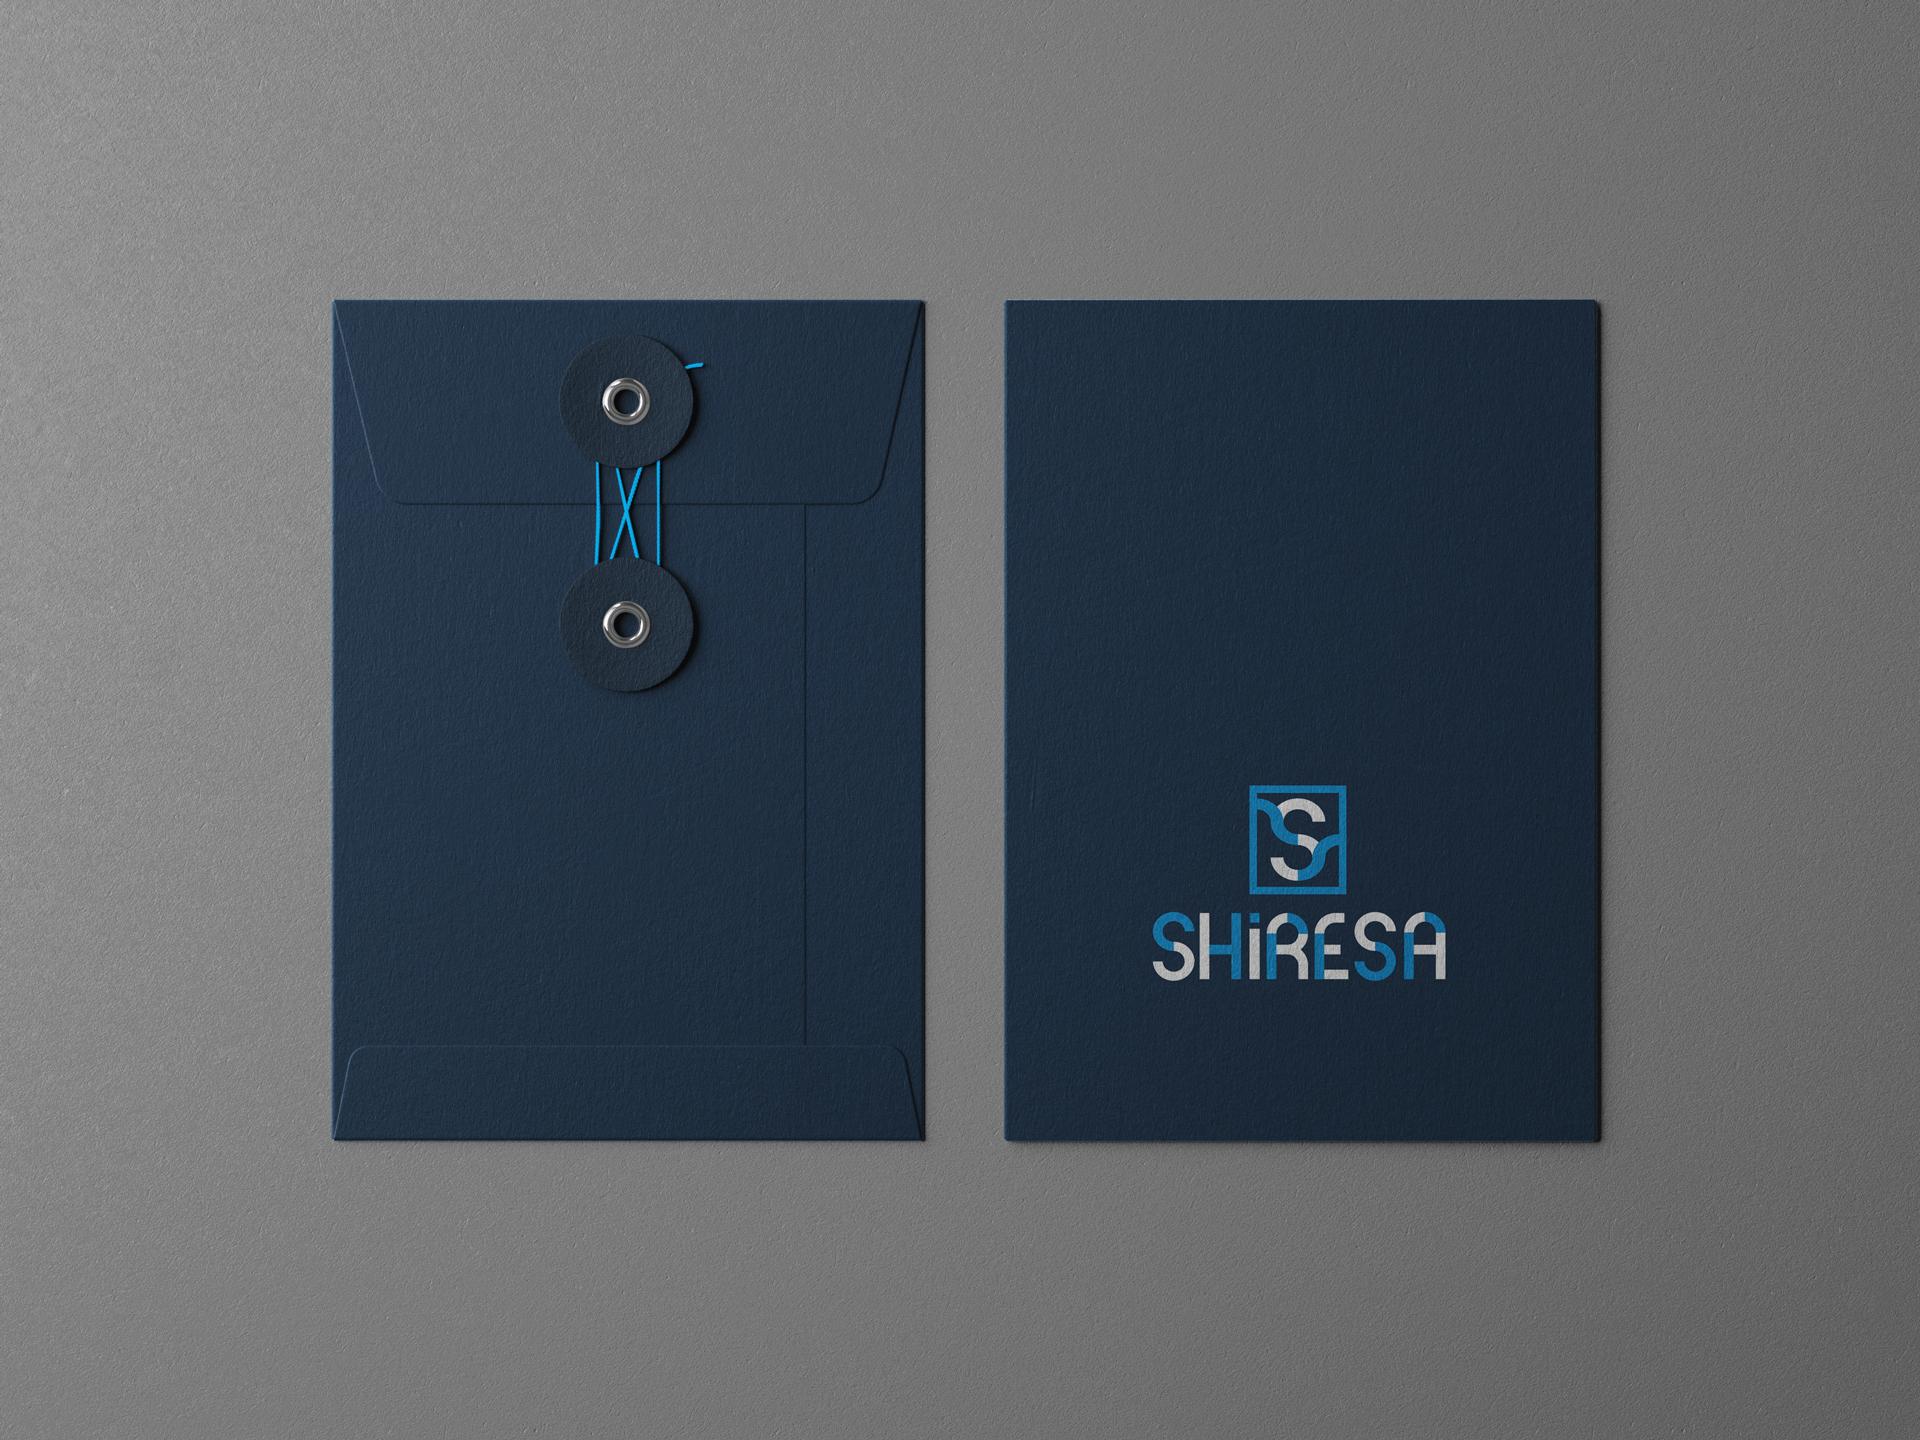 Logotipo para firma de consultoría Shiresa